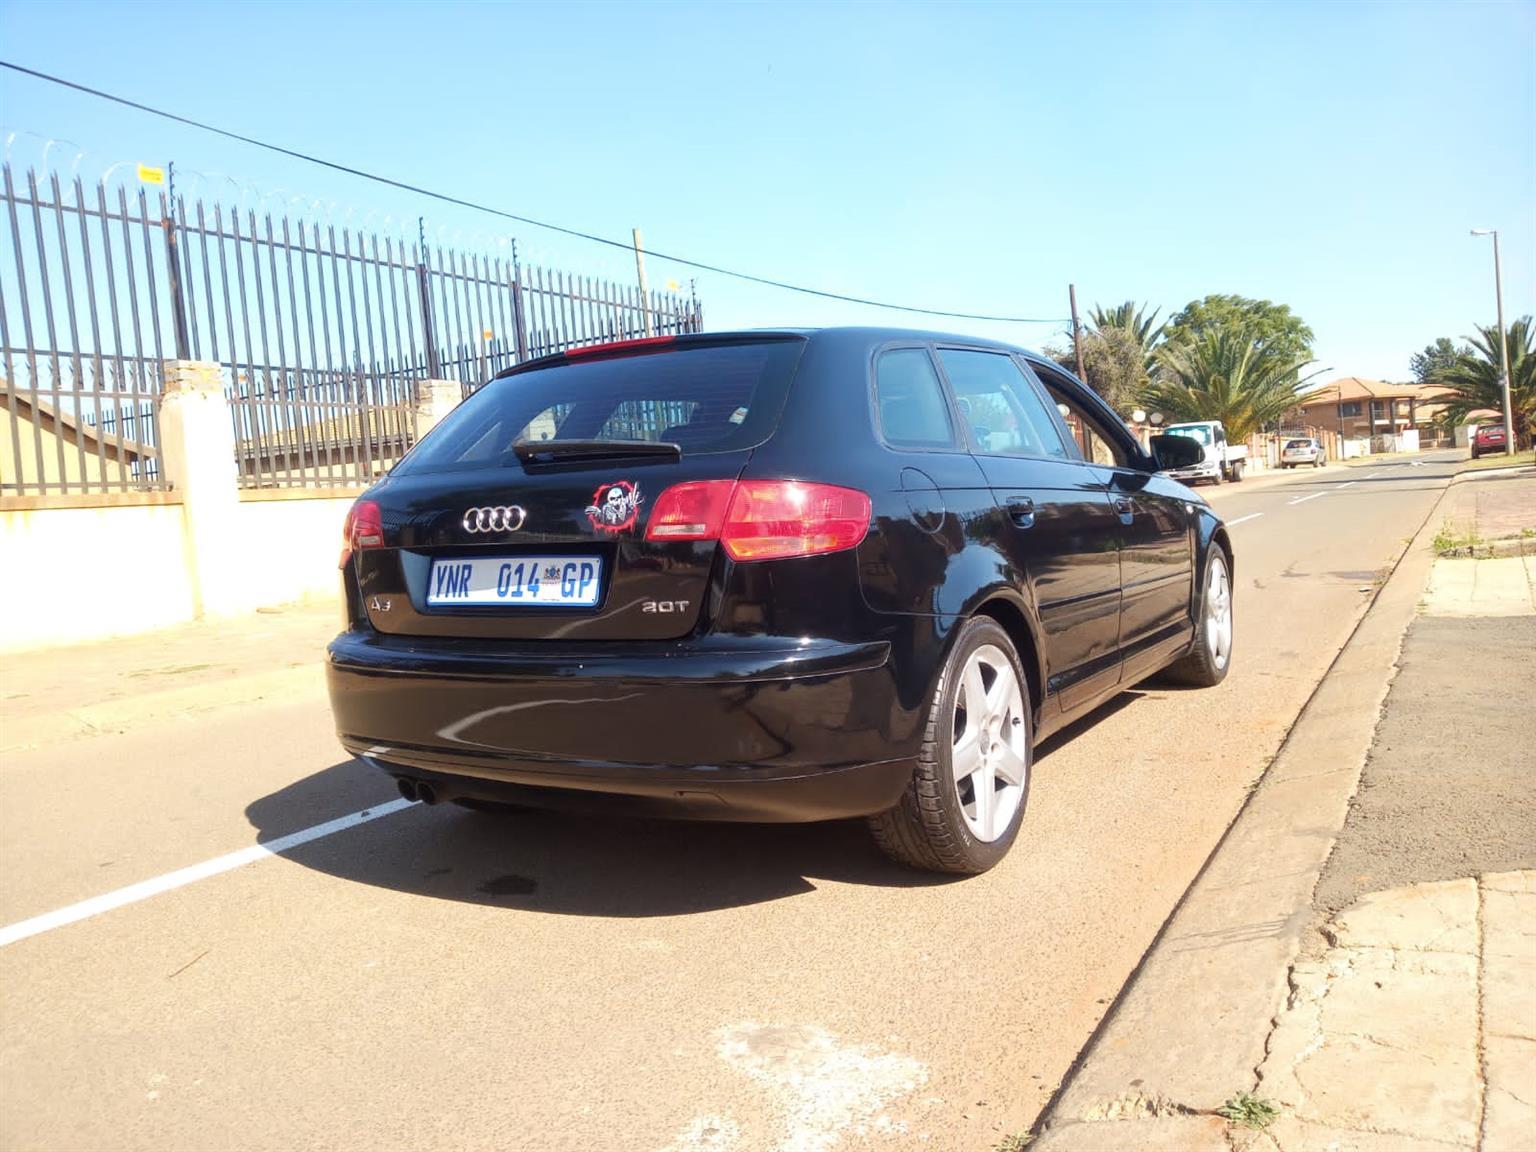 2008 Audi A3 2.0 Turbo bwa engine